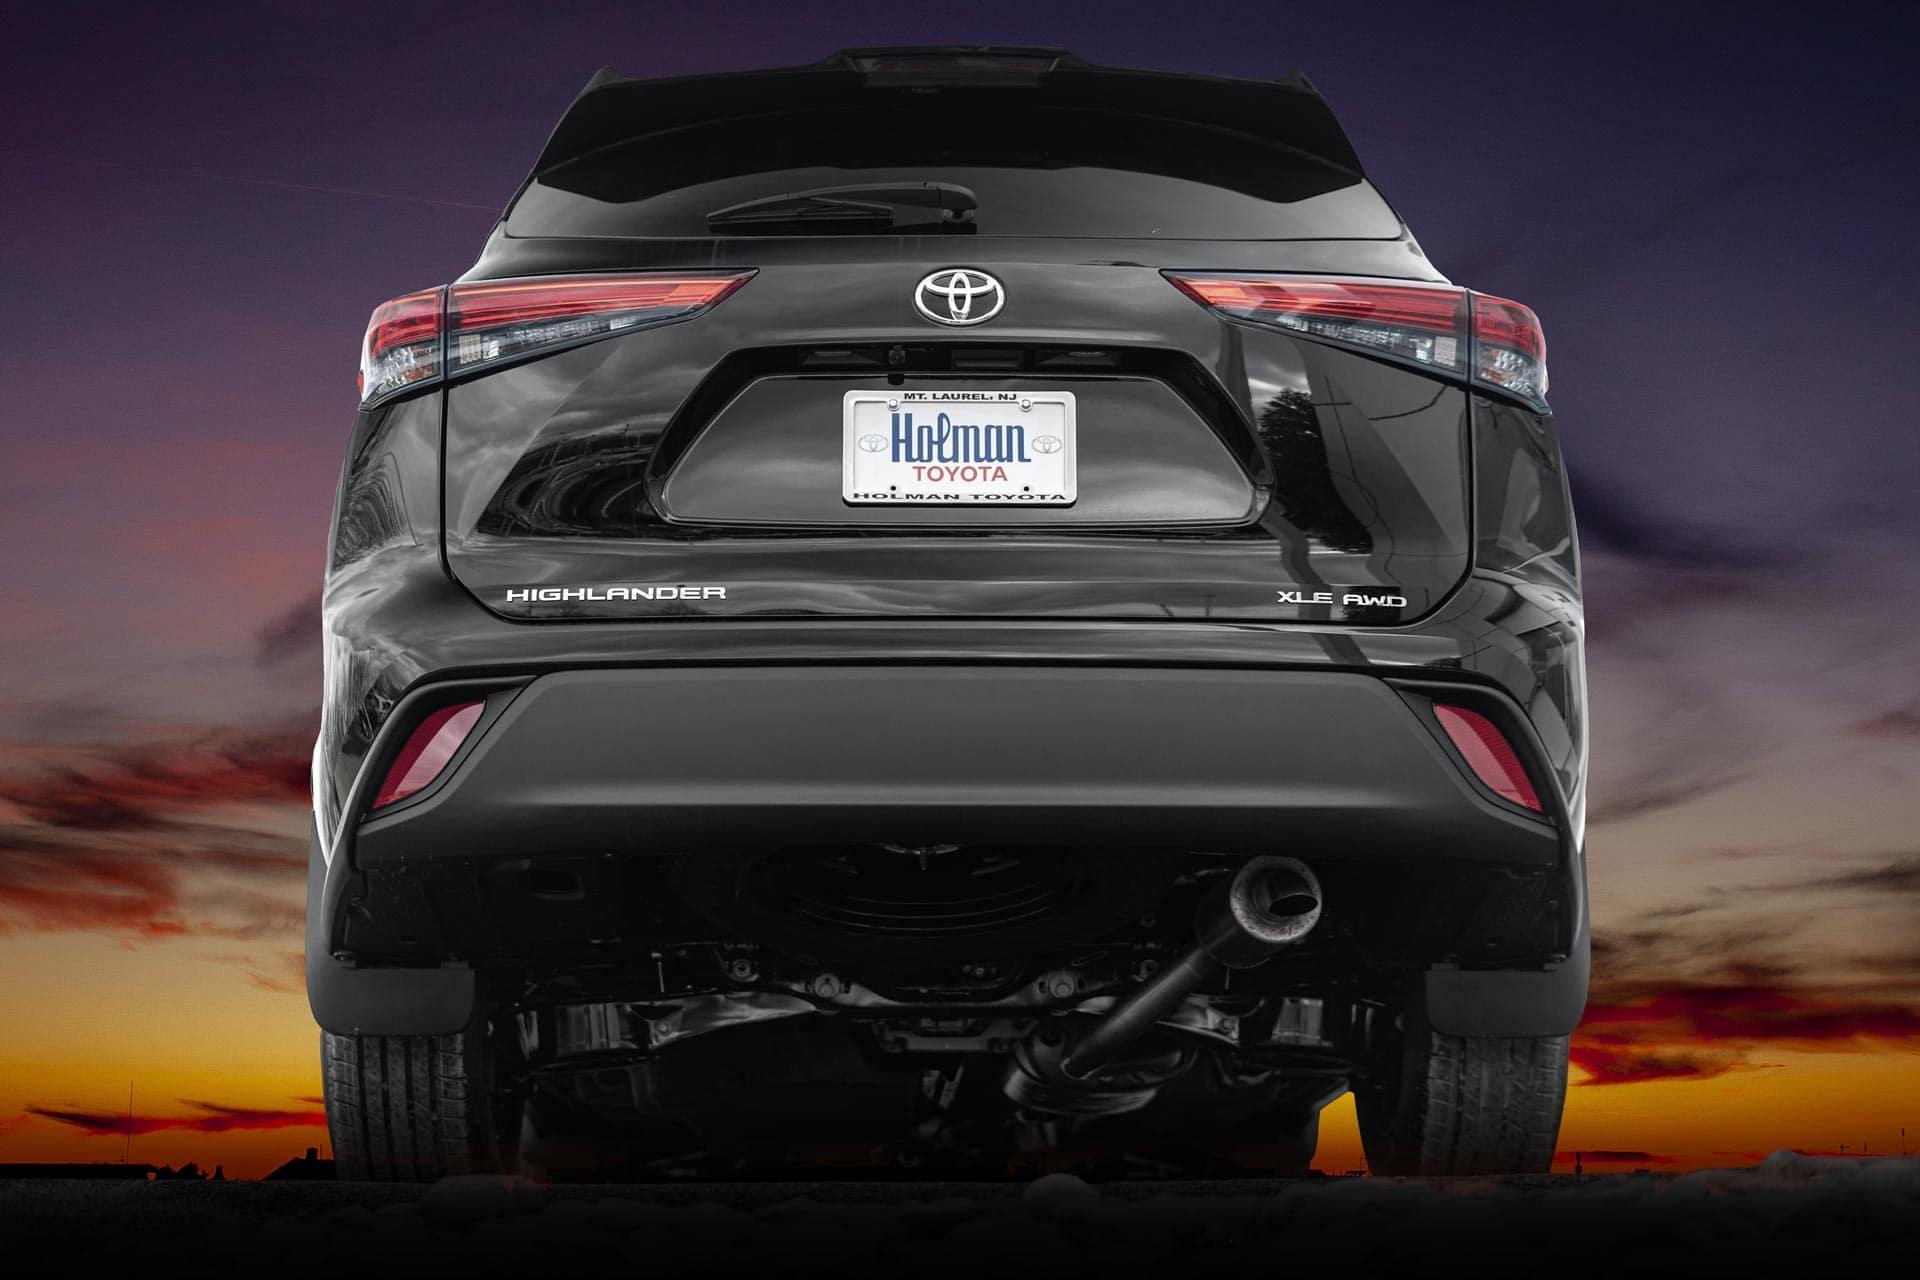 2020 Toyota Highlander rear at Holman Automotive dealership